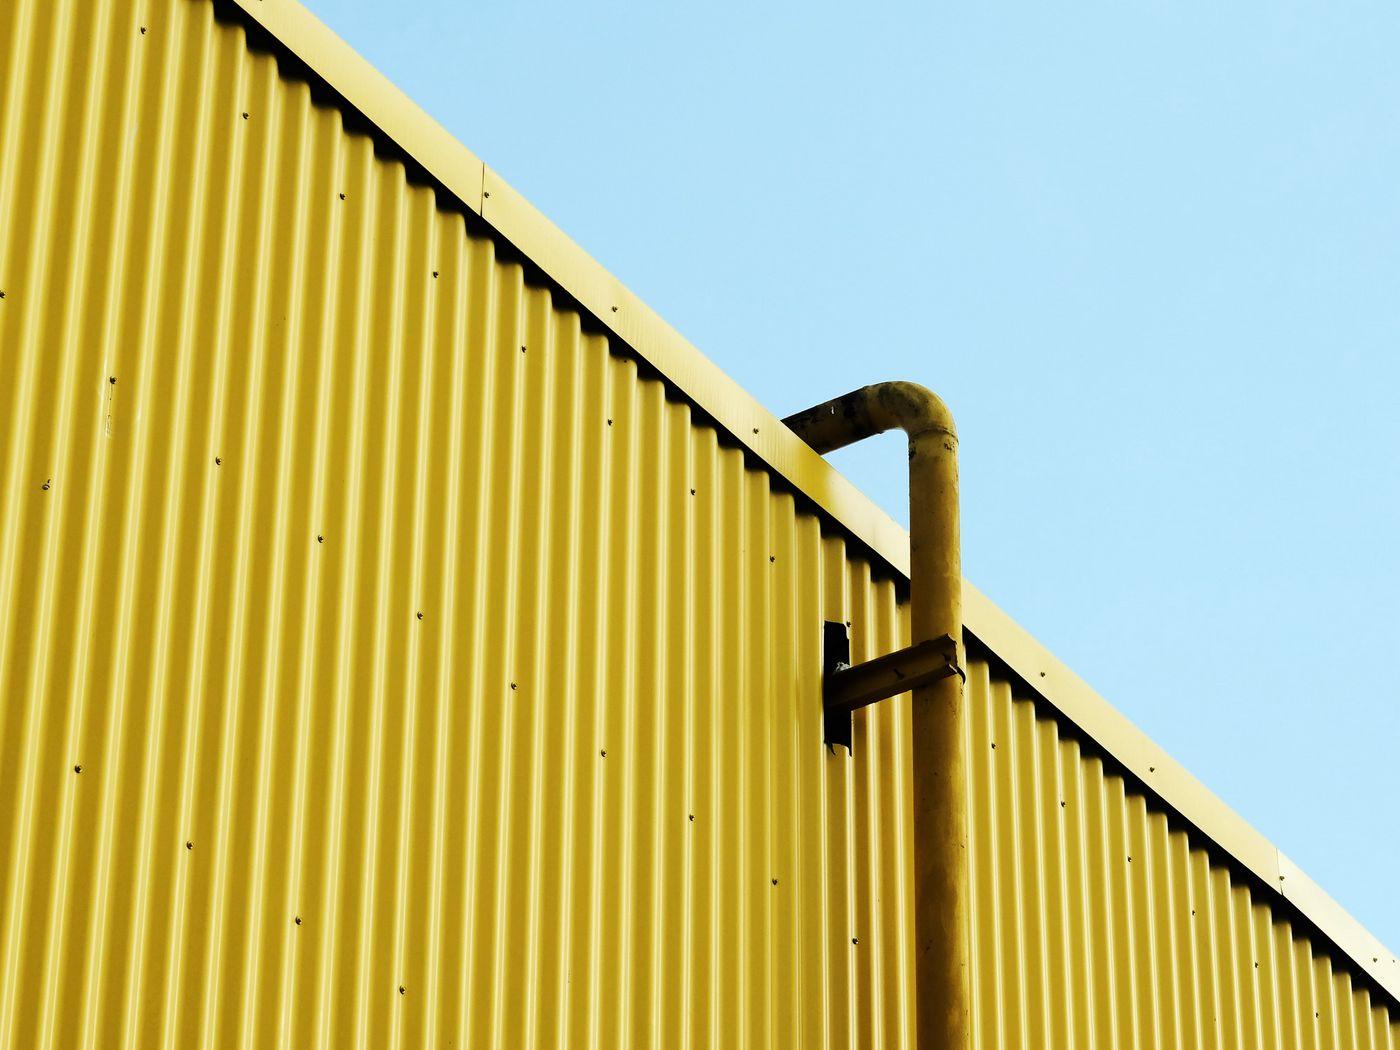 1400x1050 Wallpaper building, pipe, yellow, minimalism